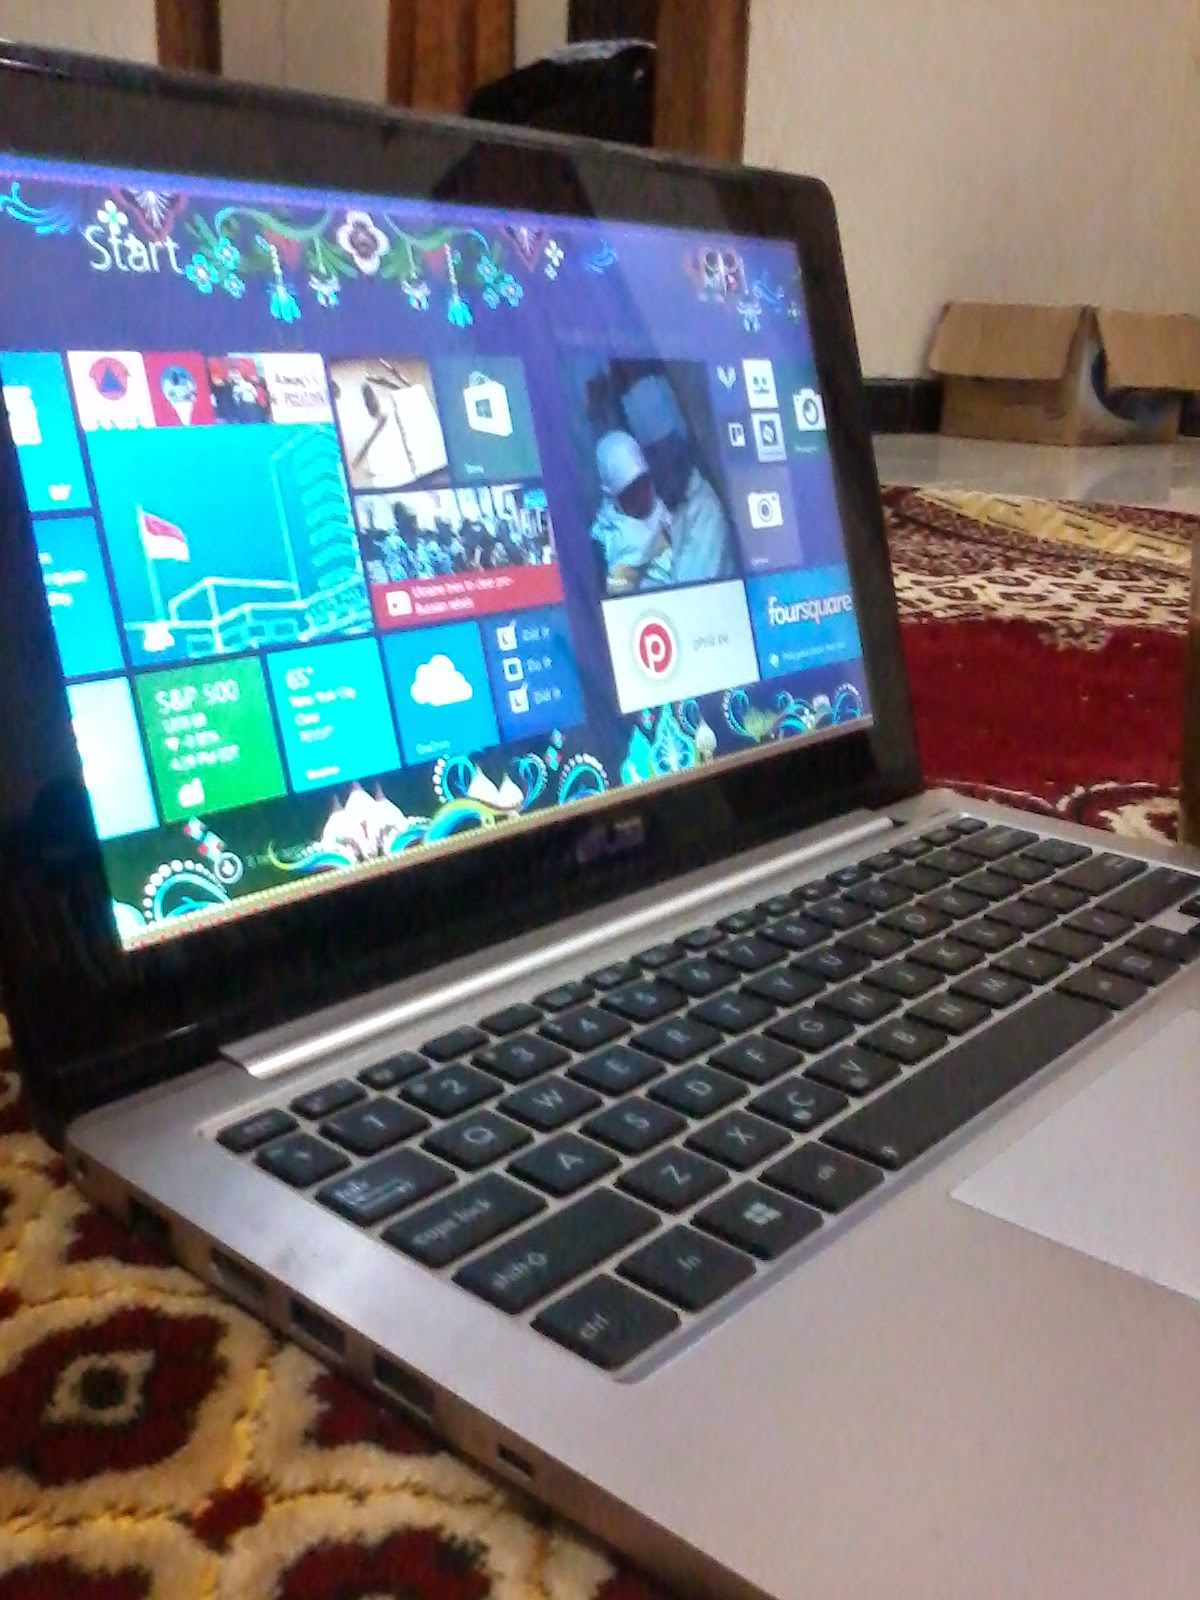 notebook terbaik, laptop, laptop ASUS, notebook ASUS, ASUS VivoBook X202